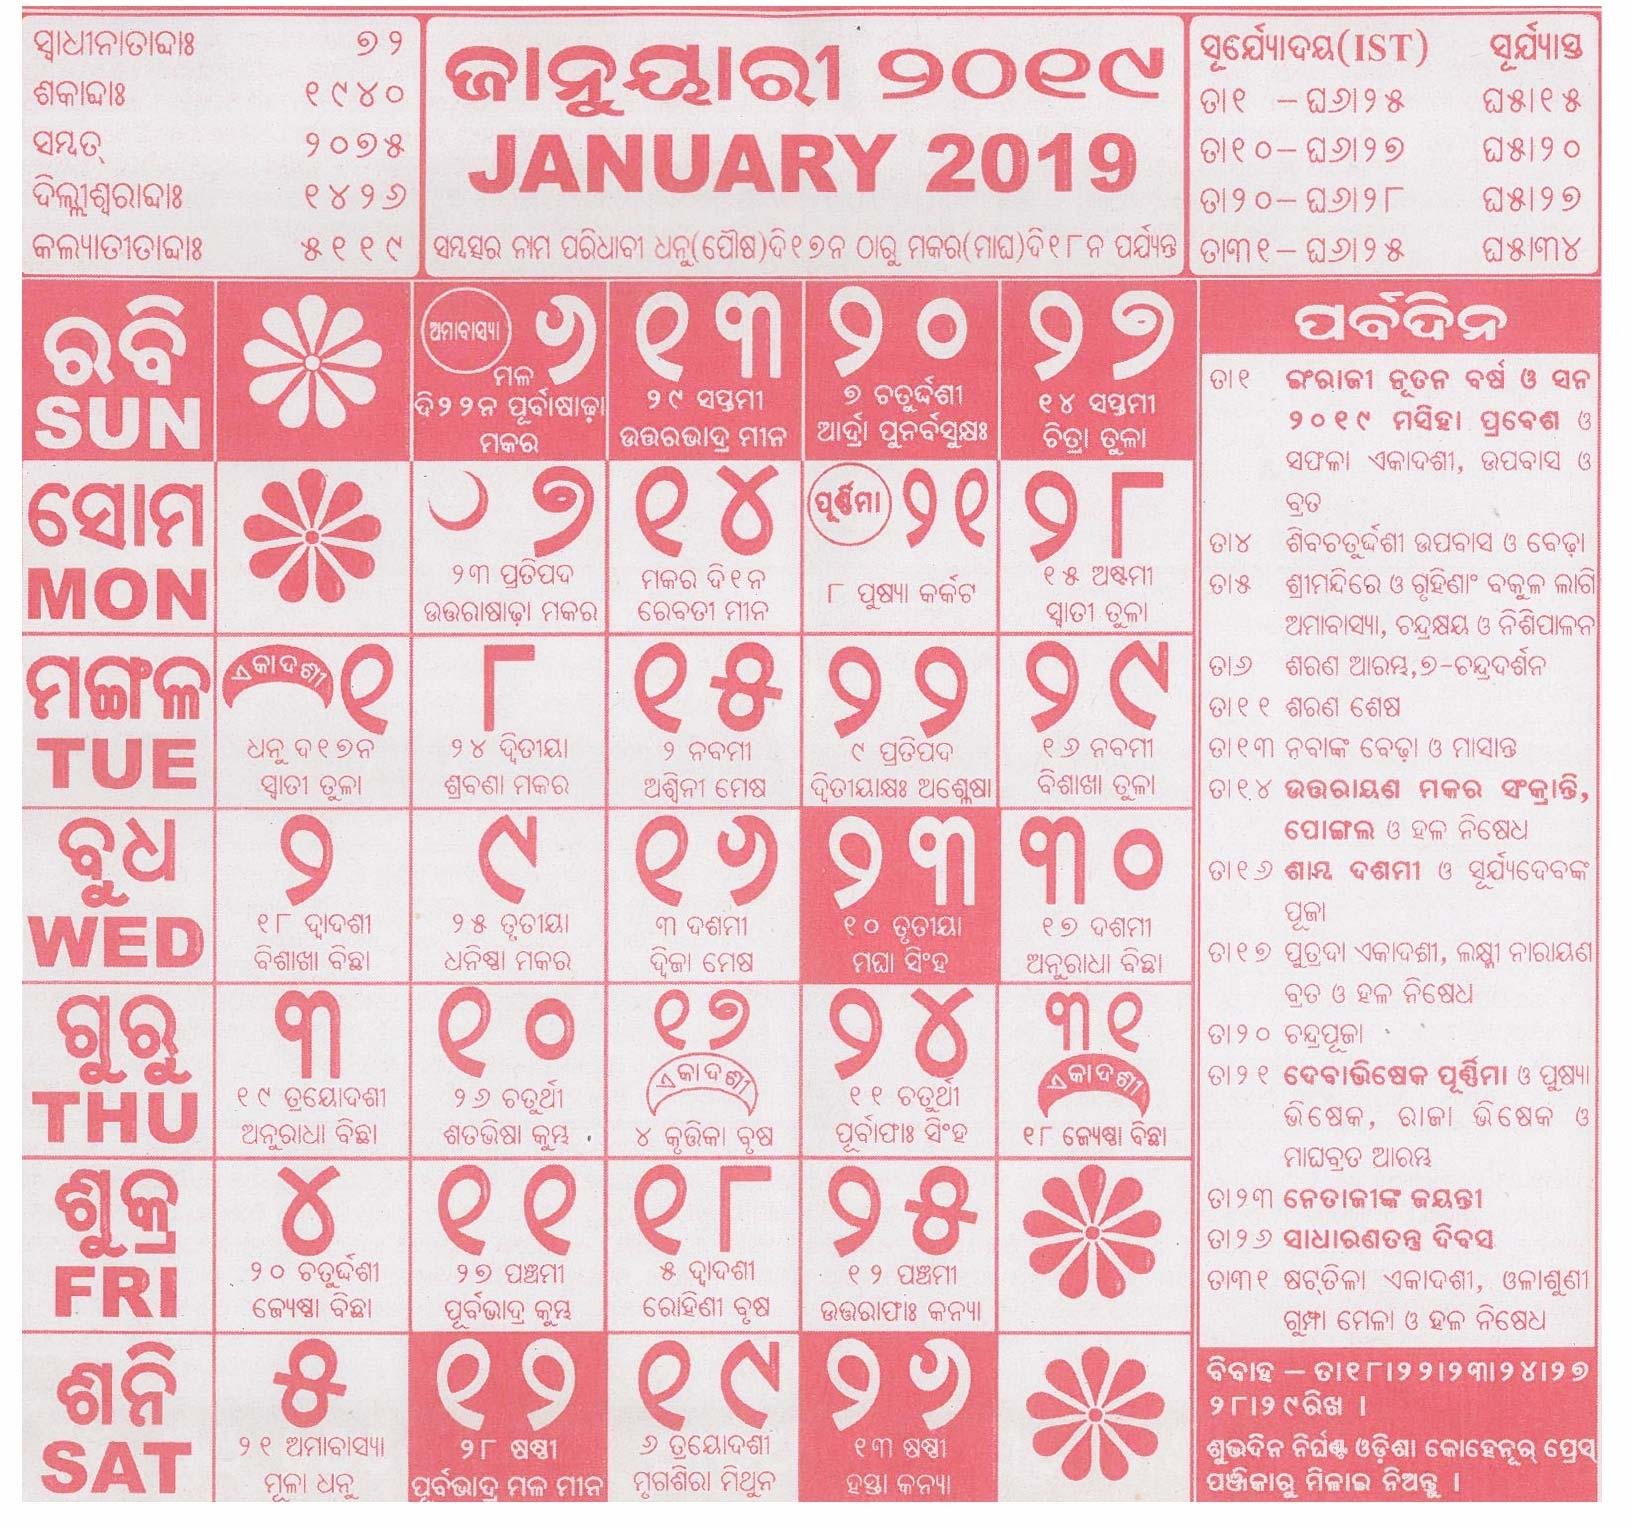 Odia Calender, Odia Panji, Odia Calendar, Kohinoor Odia Calendar in February 6 1998 Hindu Calendar